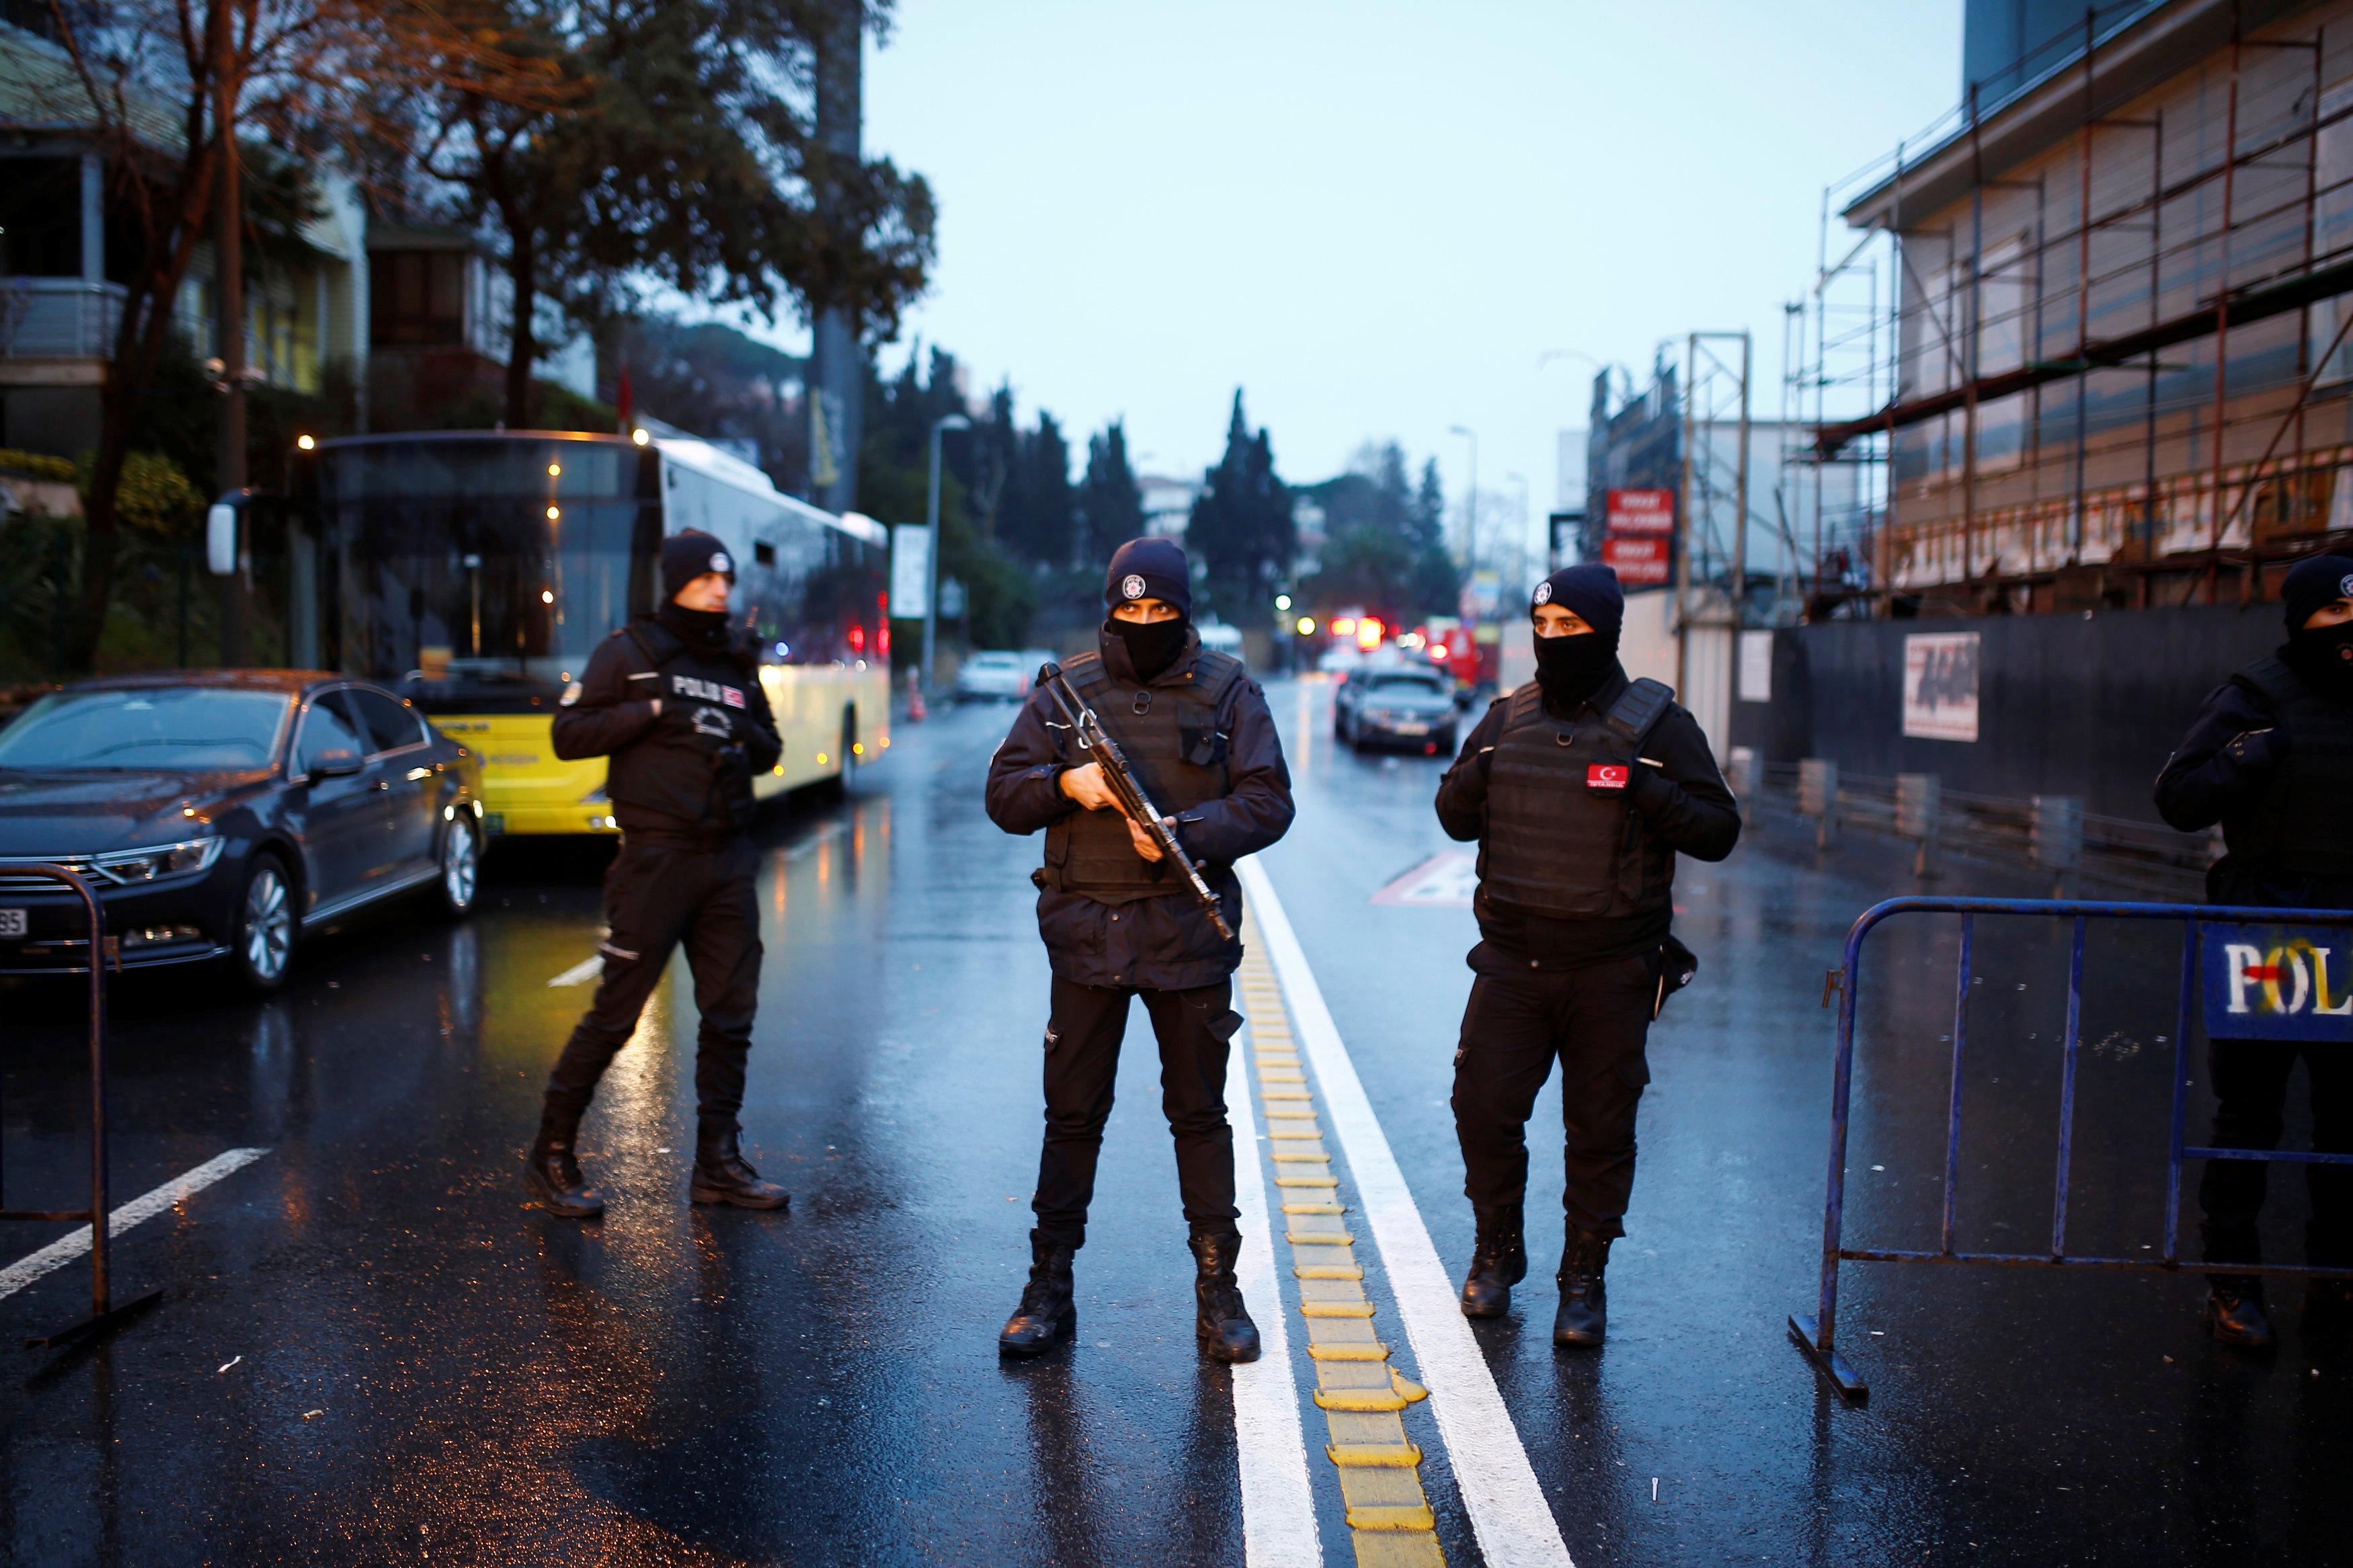 مقتل ليبي وإصابة 3 آخرين في هجوم اسطنبول